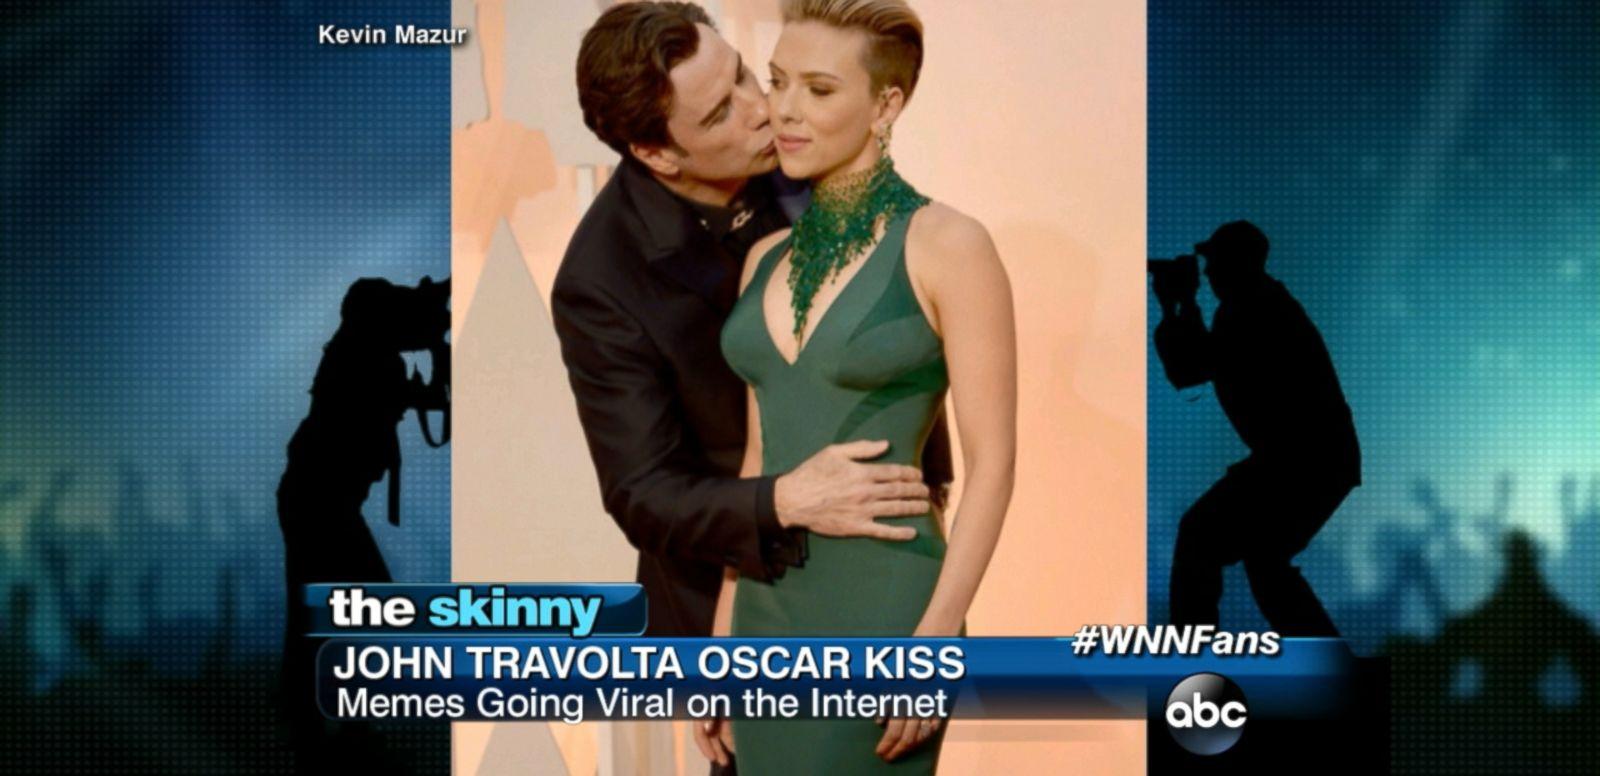 VIDEO: John Travolta gave Scarlett Johansson a kiss on the cheek while on the red carpet.